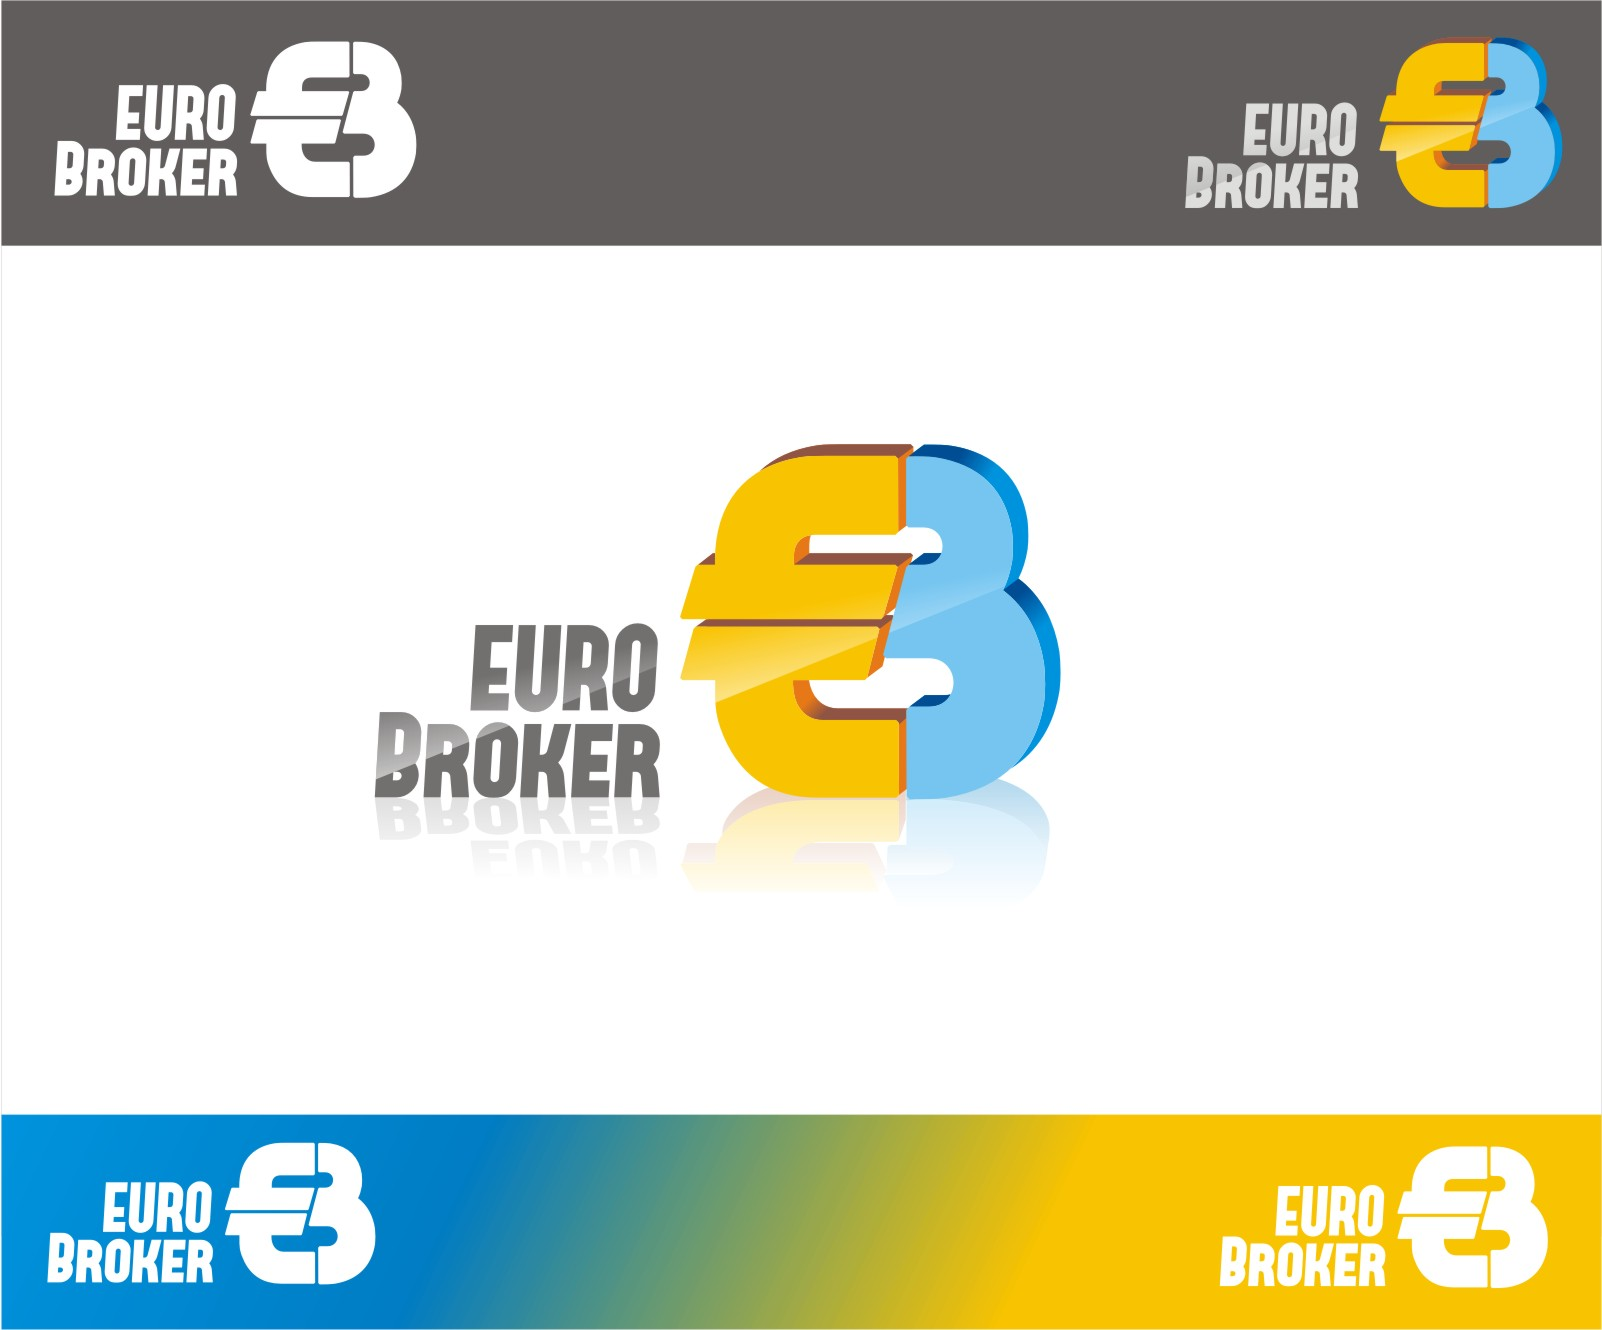 Разработка логотипа компании для сайта фото f_4be7fa6b02438.jpg